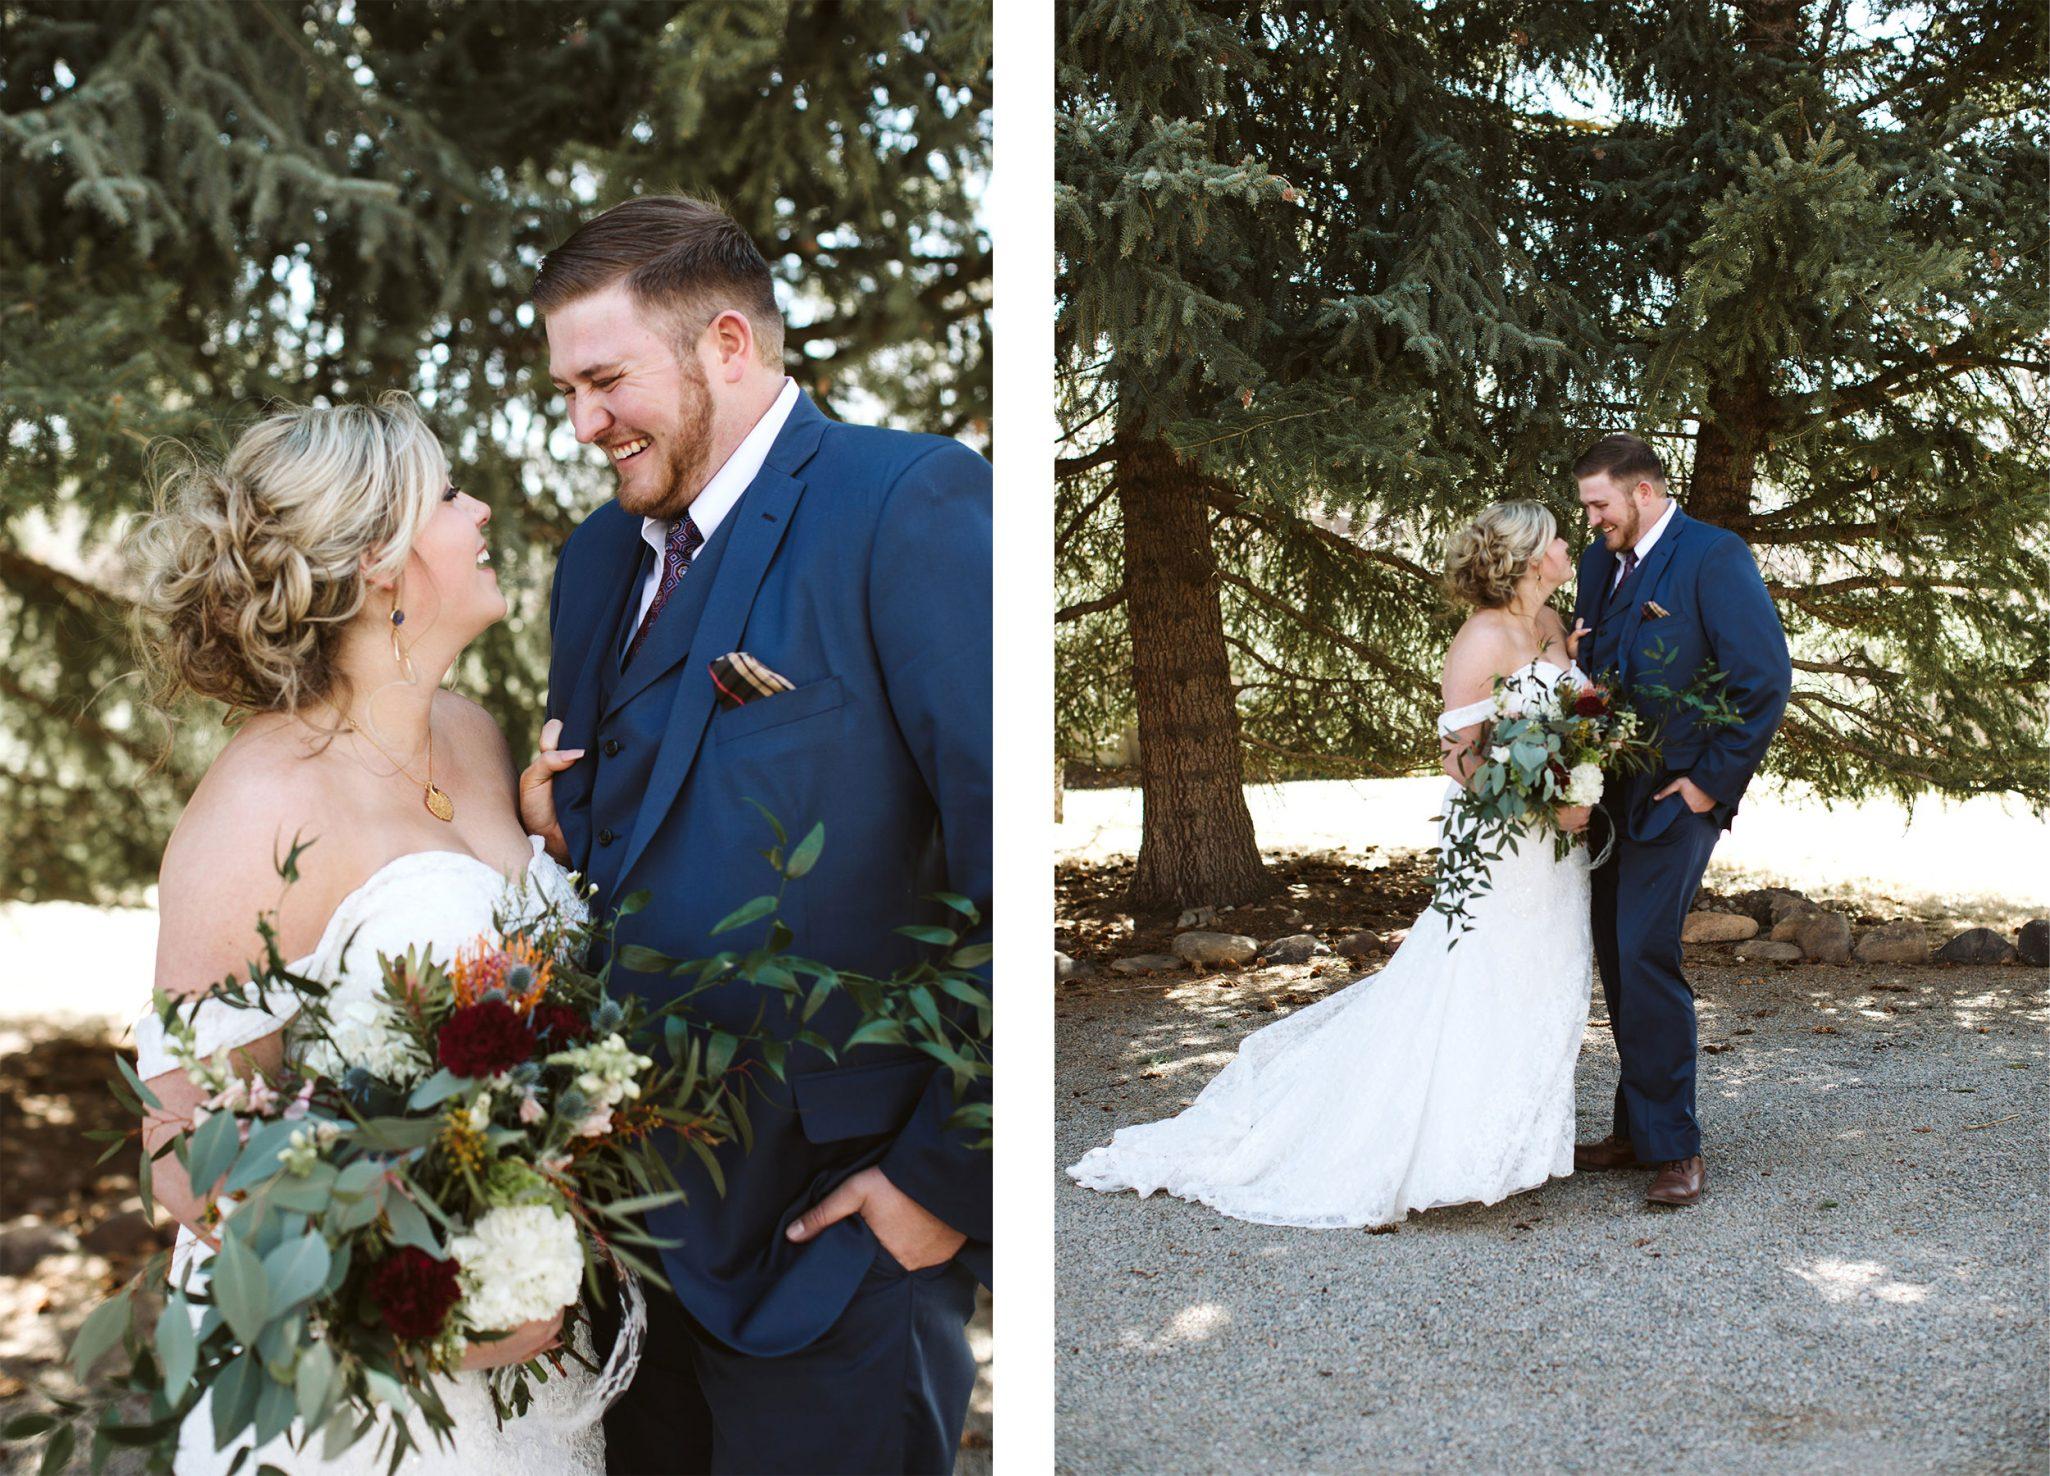 Bride & Groom at Ridgewood Event Center | Durango Weddings Magazine